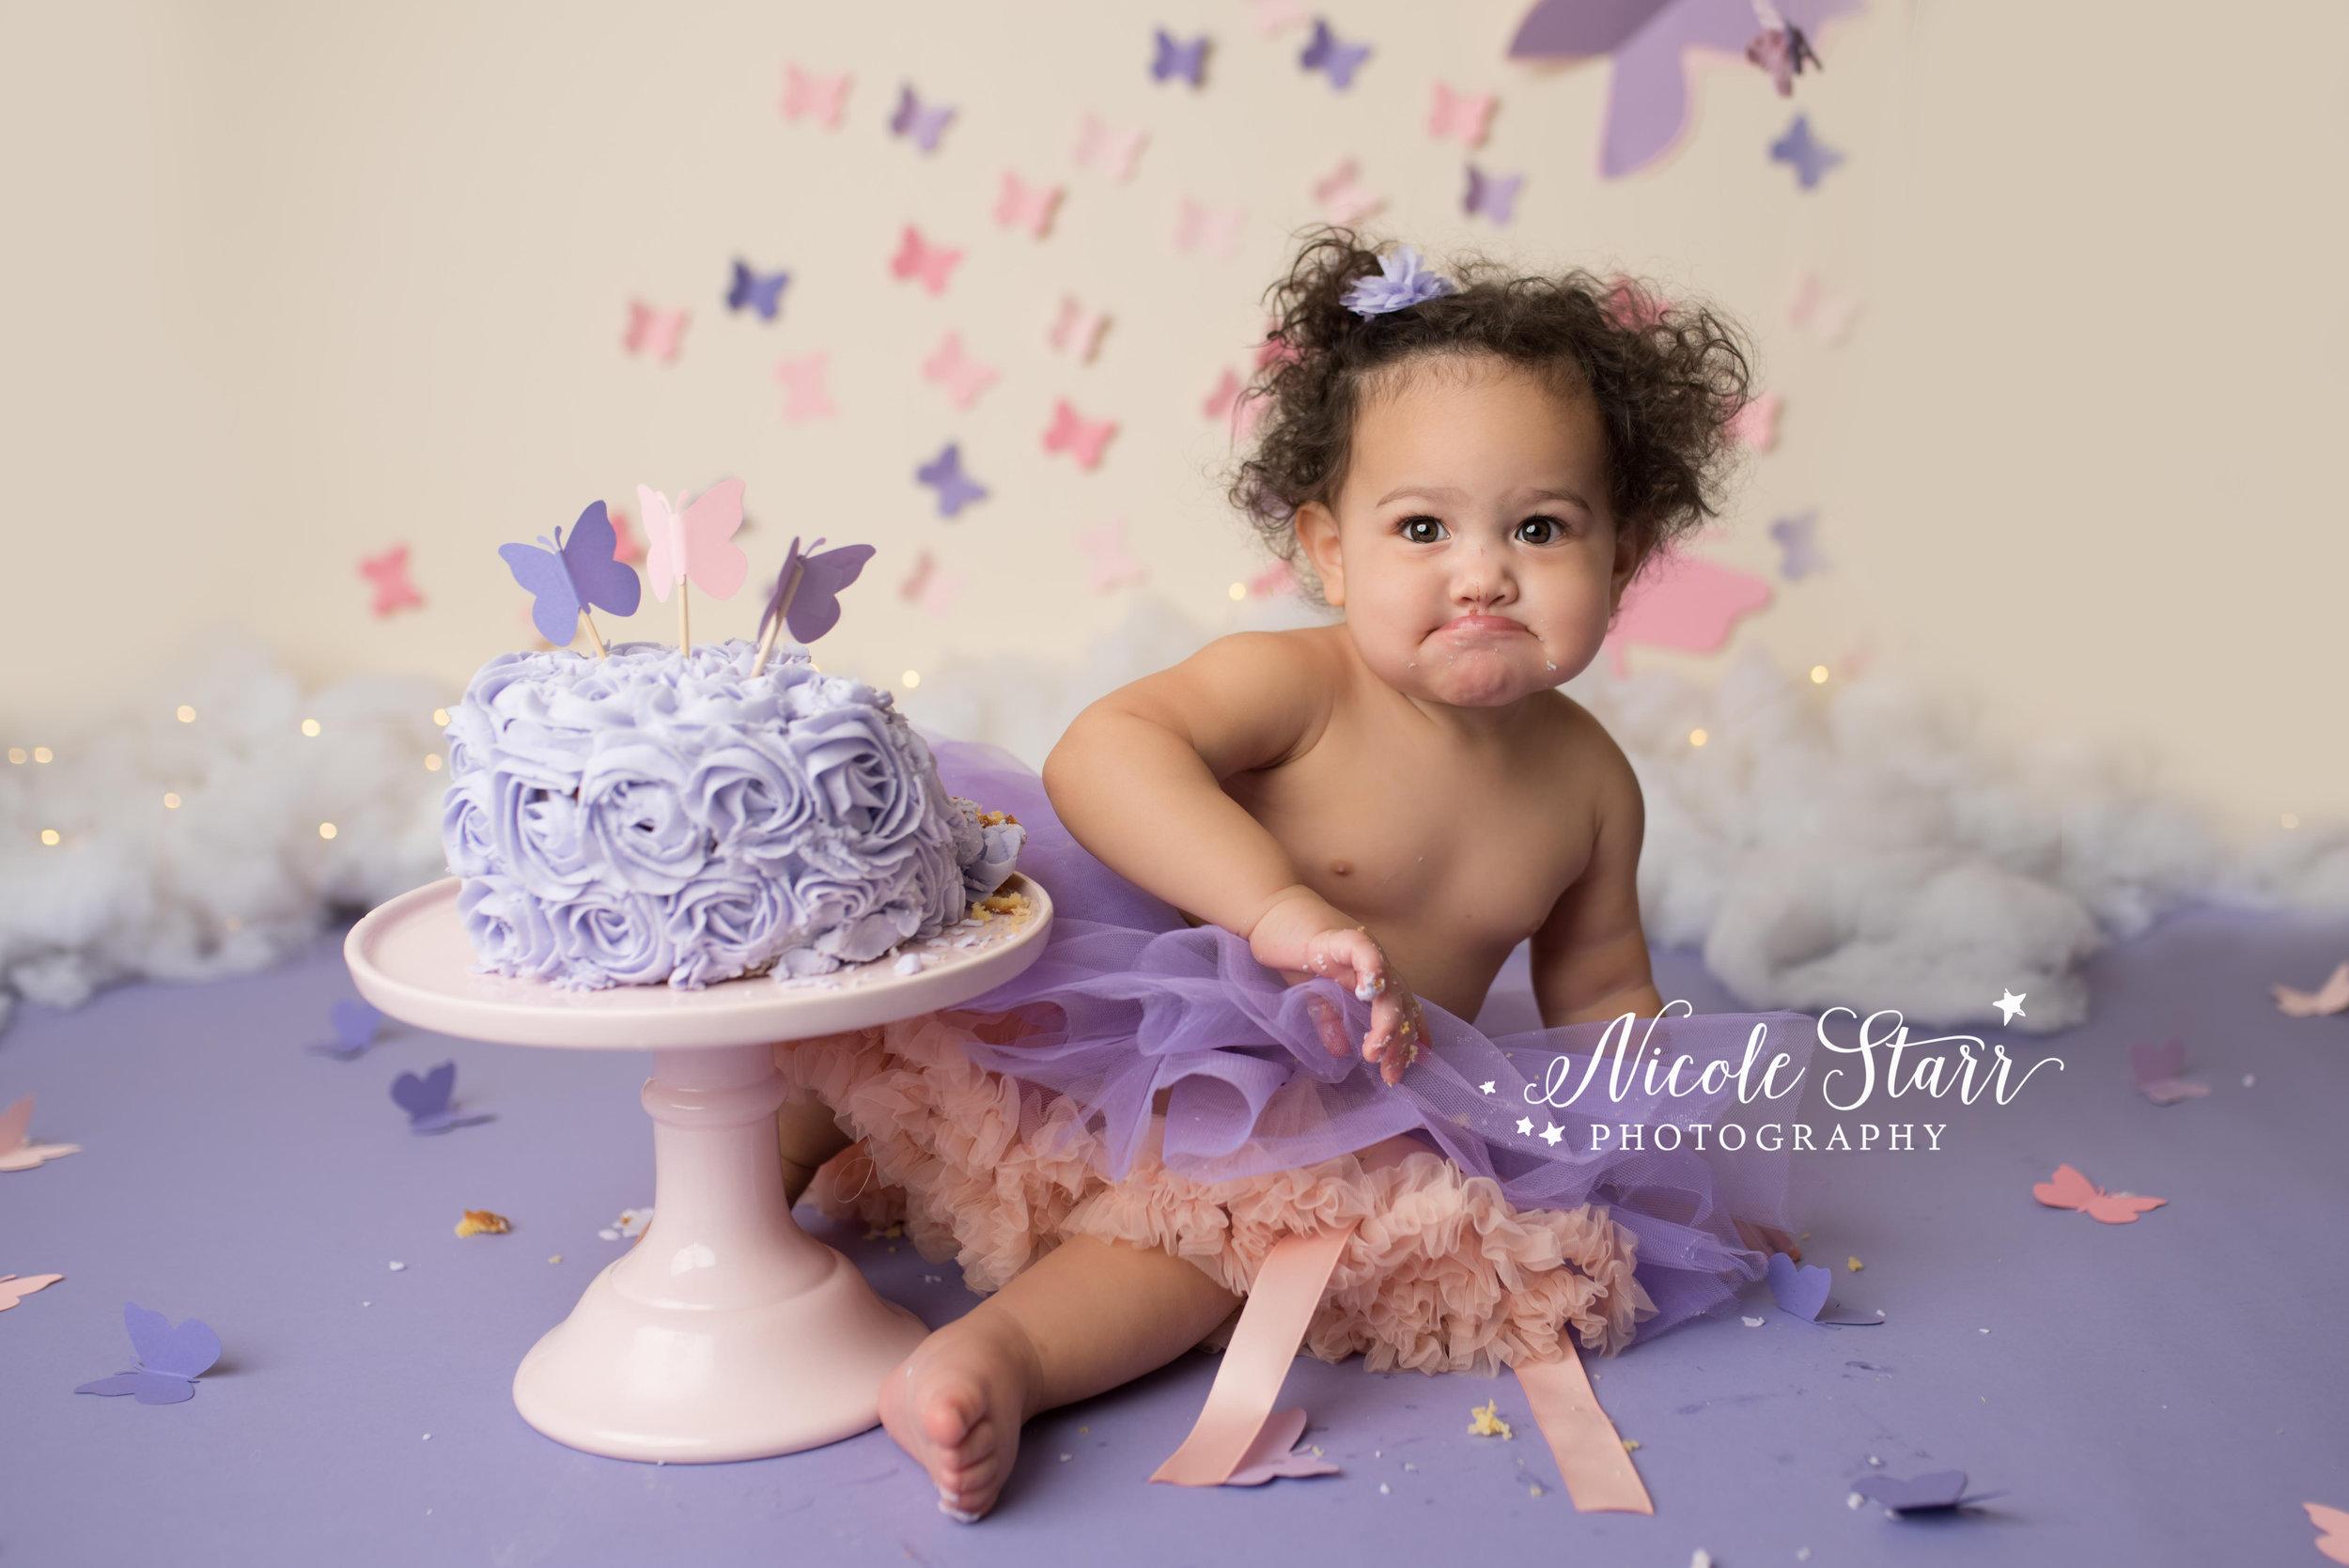 Saratoga Springs baby photographer Albany baby photographer Boston baby photographer, Upstate NY baby photographer